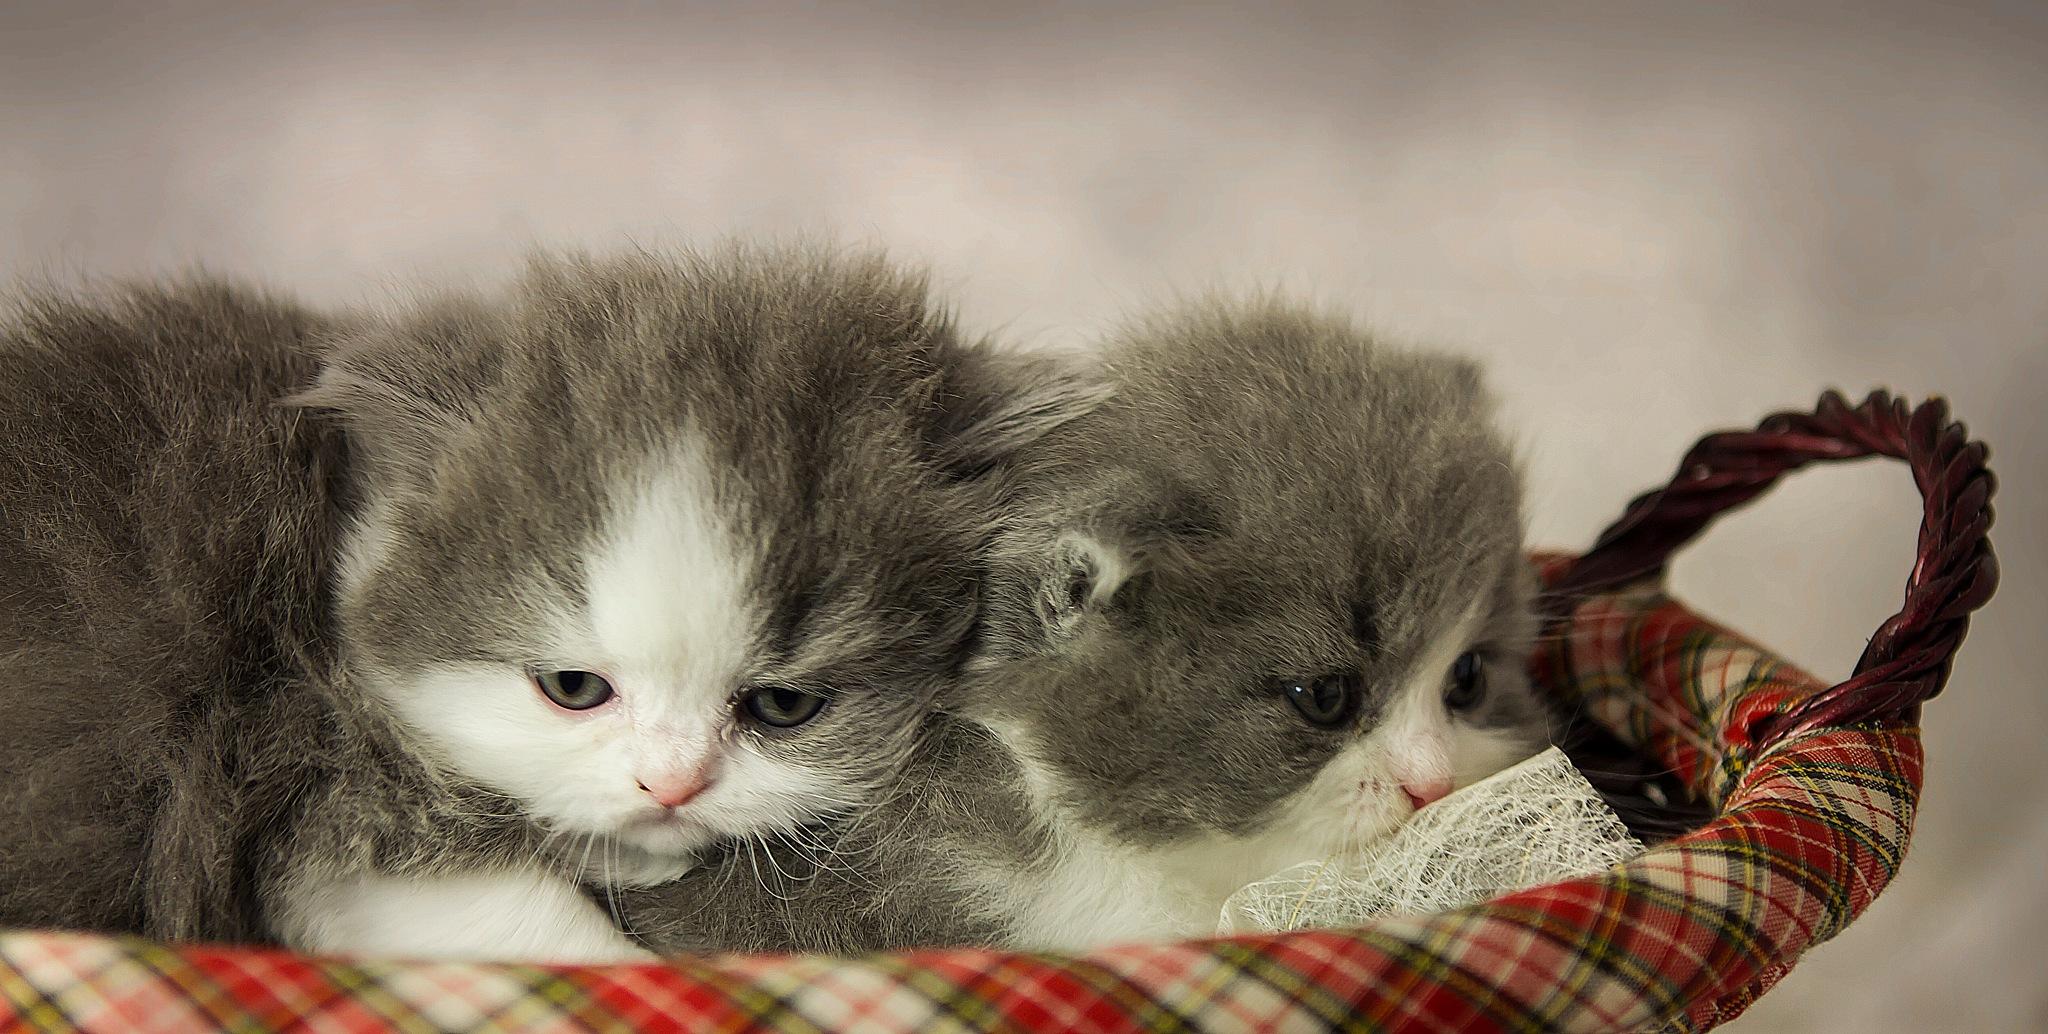 kittens by Renaat